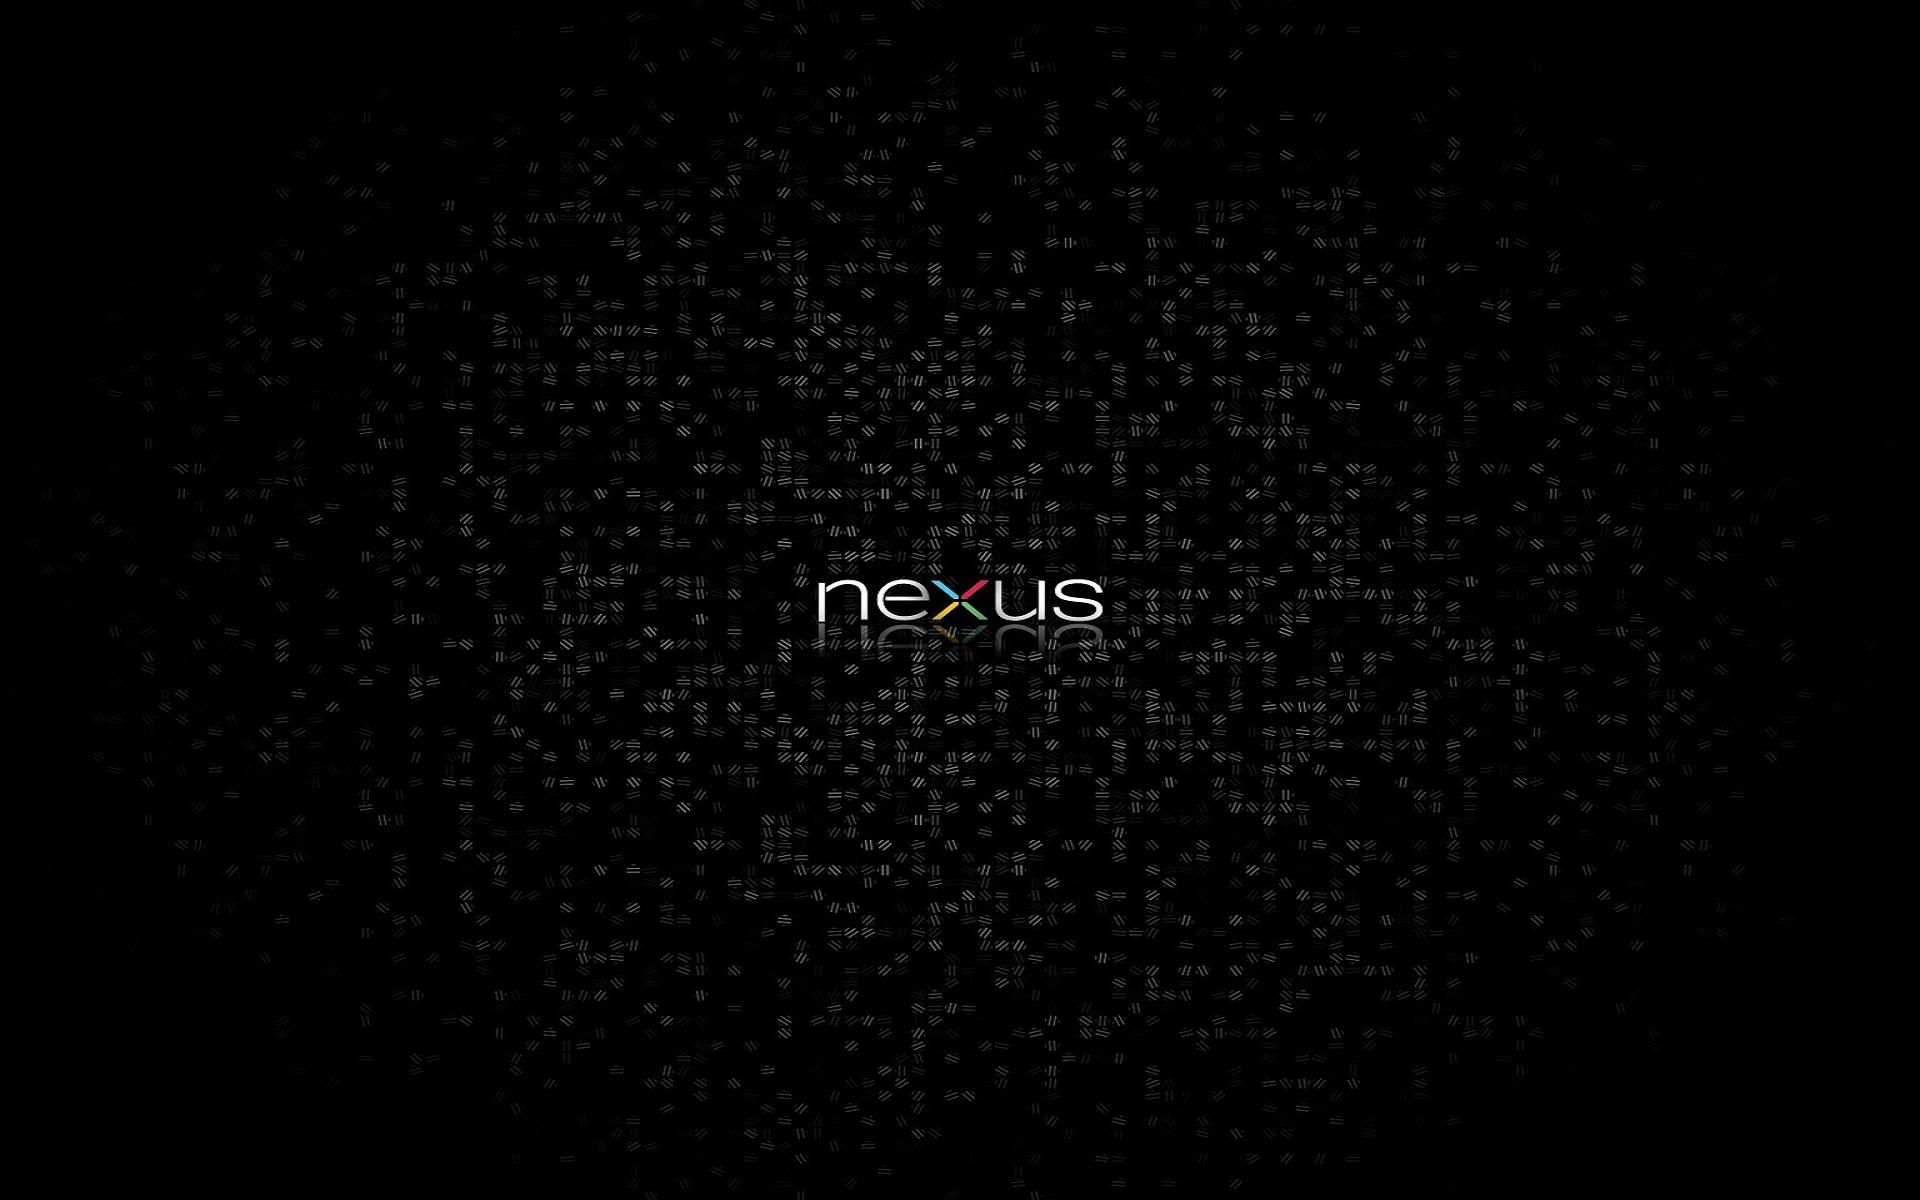 Nexus 6 Wallpapers High Quality at Cool Monodomo 1920x1200